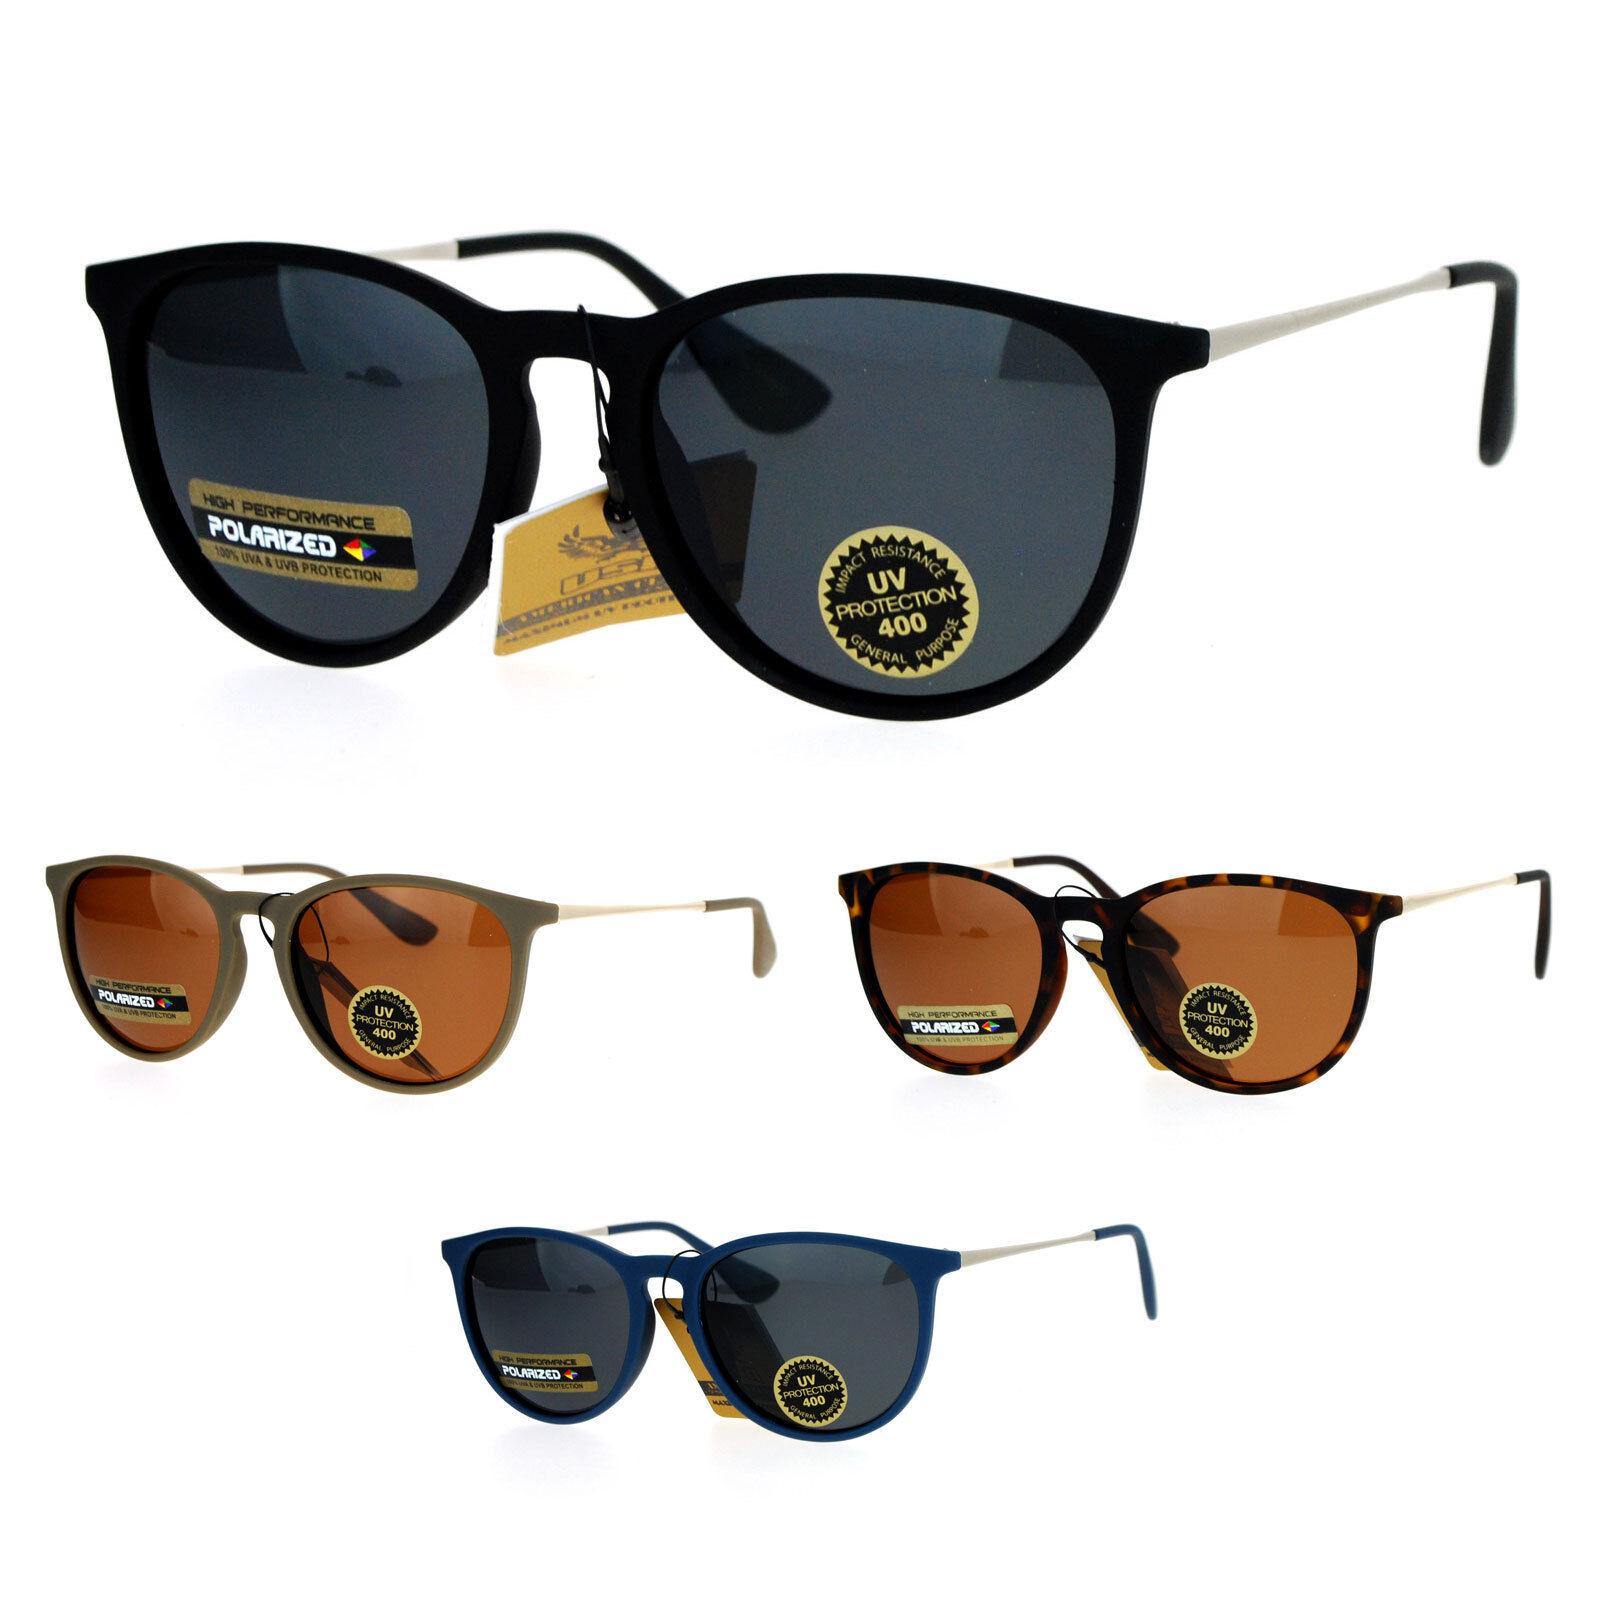 SA106 Polarized Lens Rubberized Matte Horn Rim Retro Sunglasses